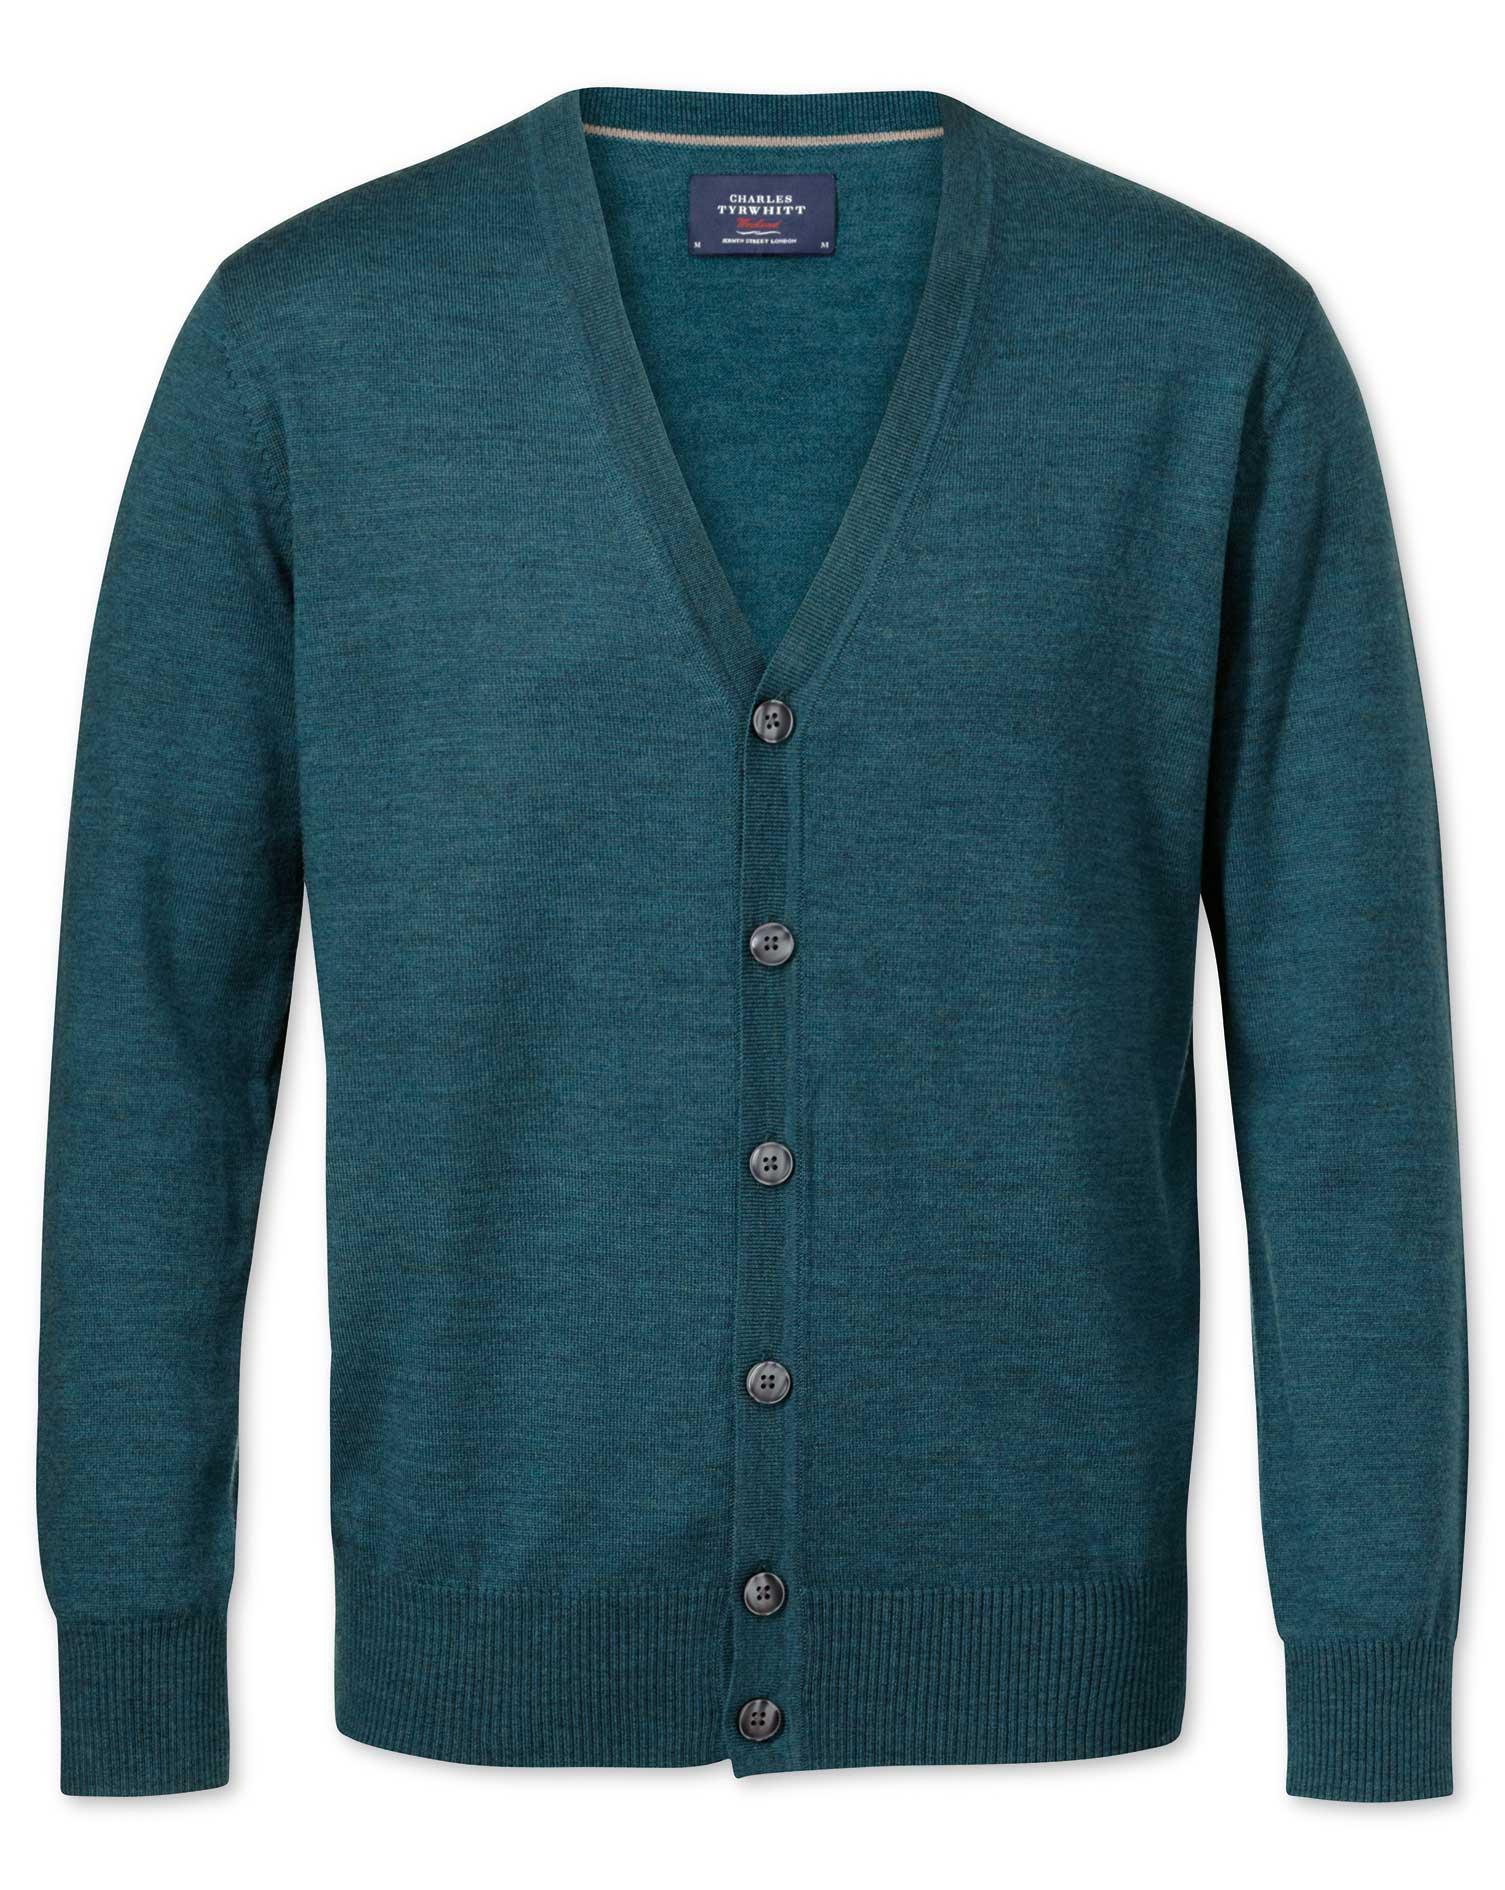 Green Merino Wool Cardigan Size Large by Charles Tyrwhitt